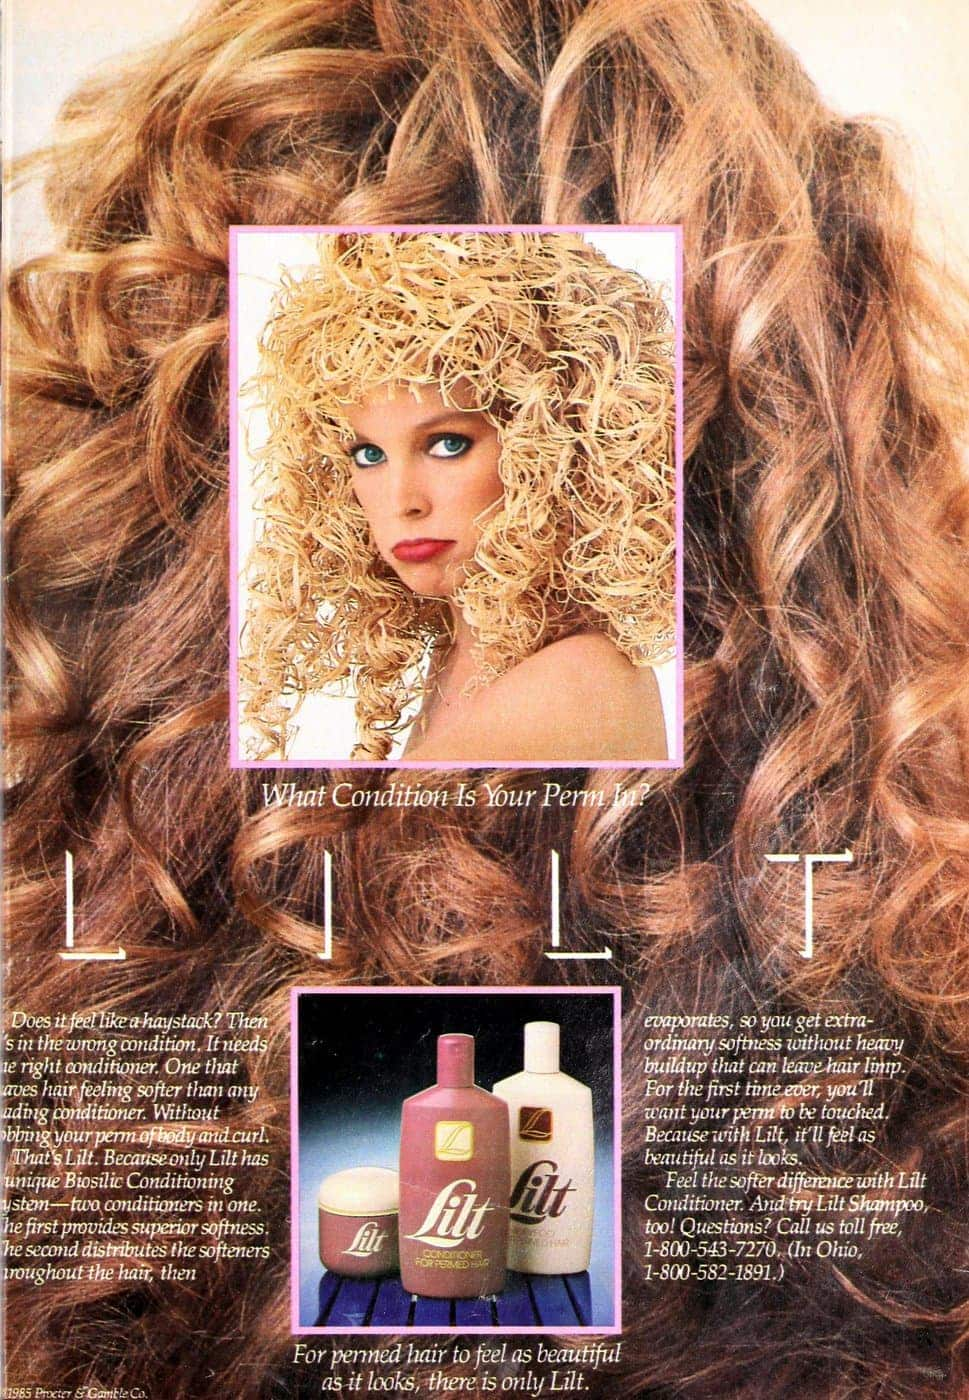 Lilt perm shampoo from 1985